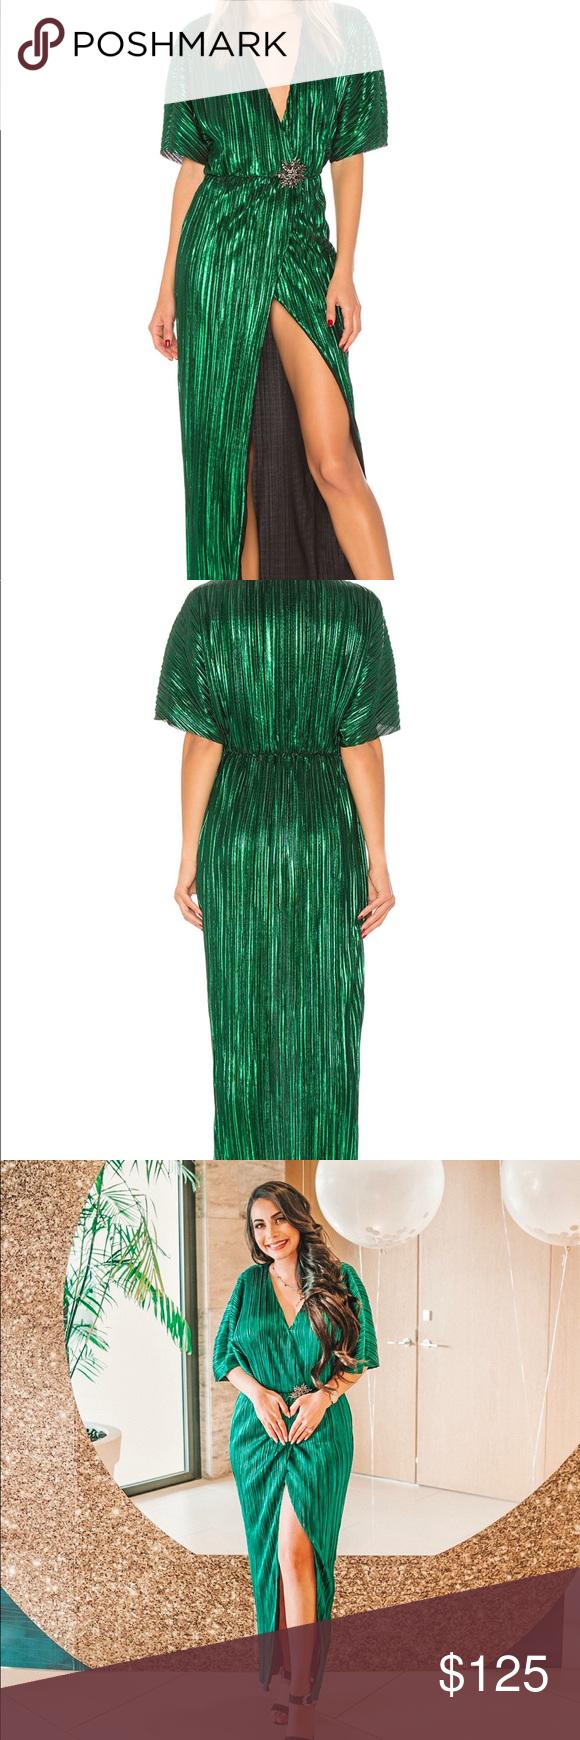 Green Metallic House Of Harlow Dress Dresses House Of Harlow 1960 Dress [ 1740 x 580 Pixel ]